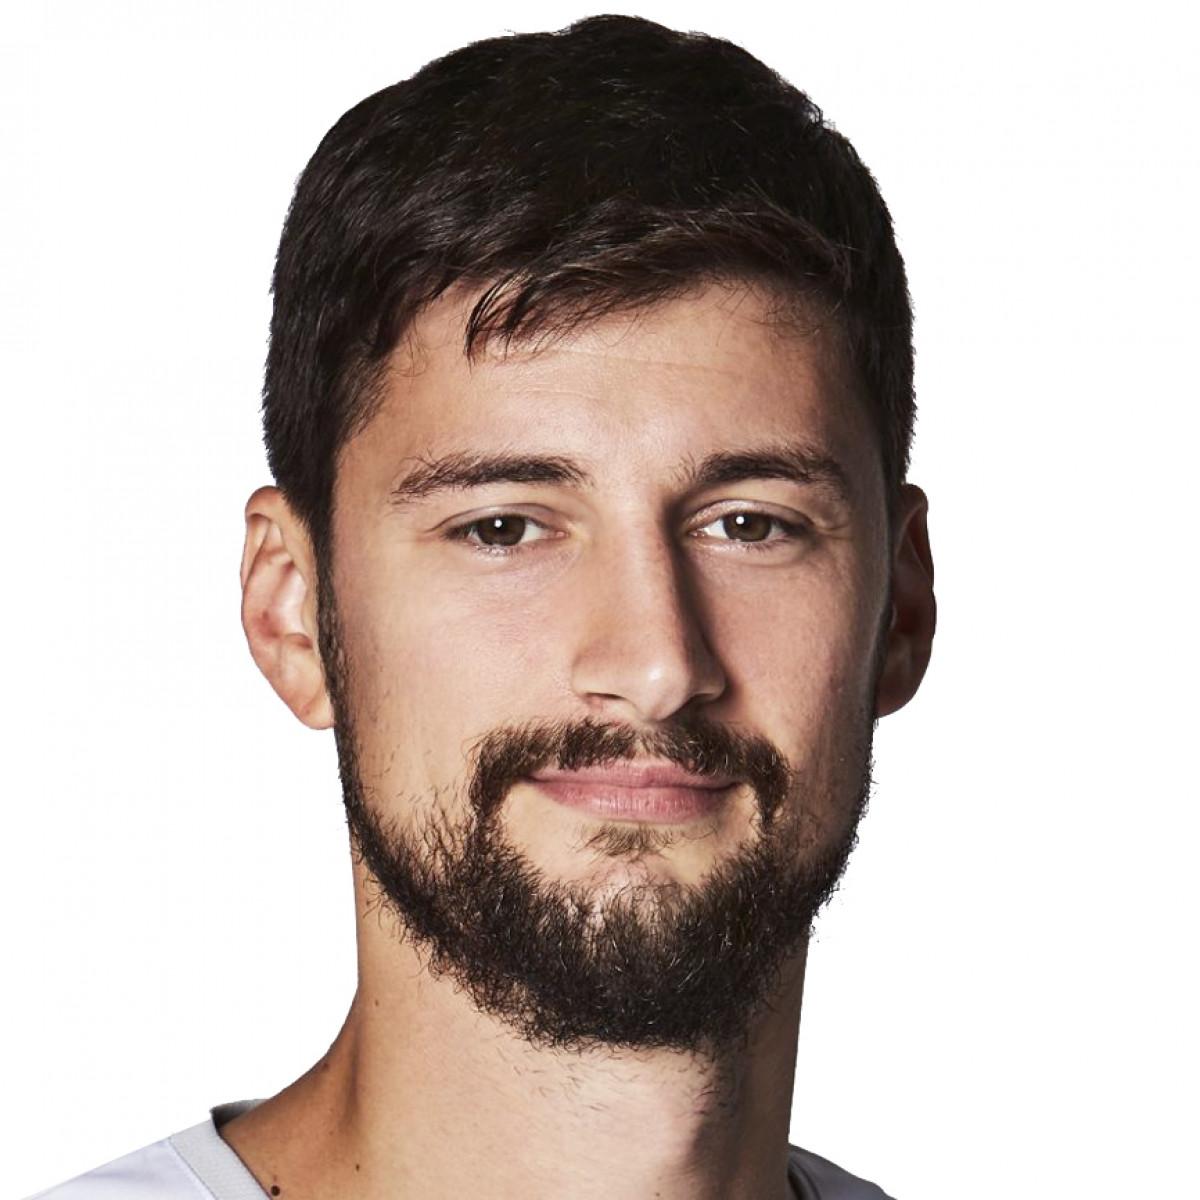 Darko Jukic